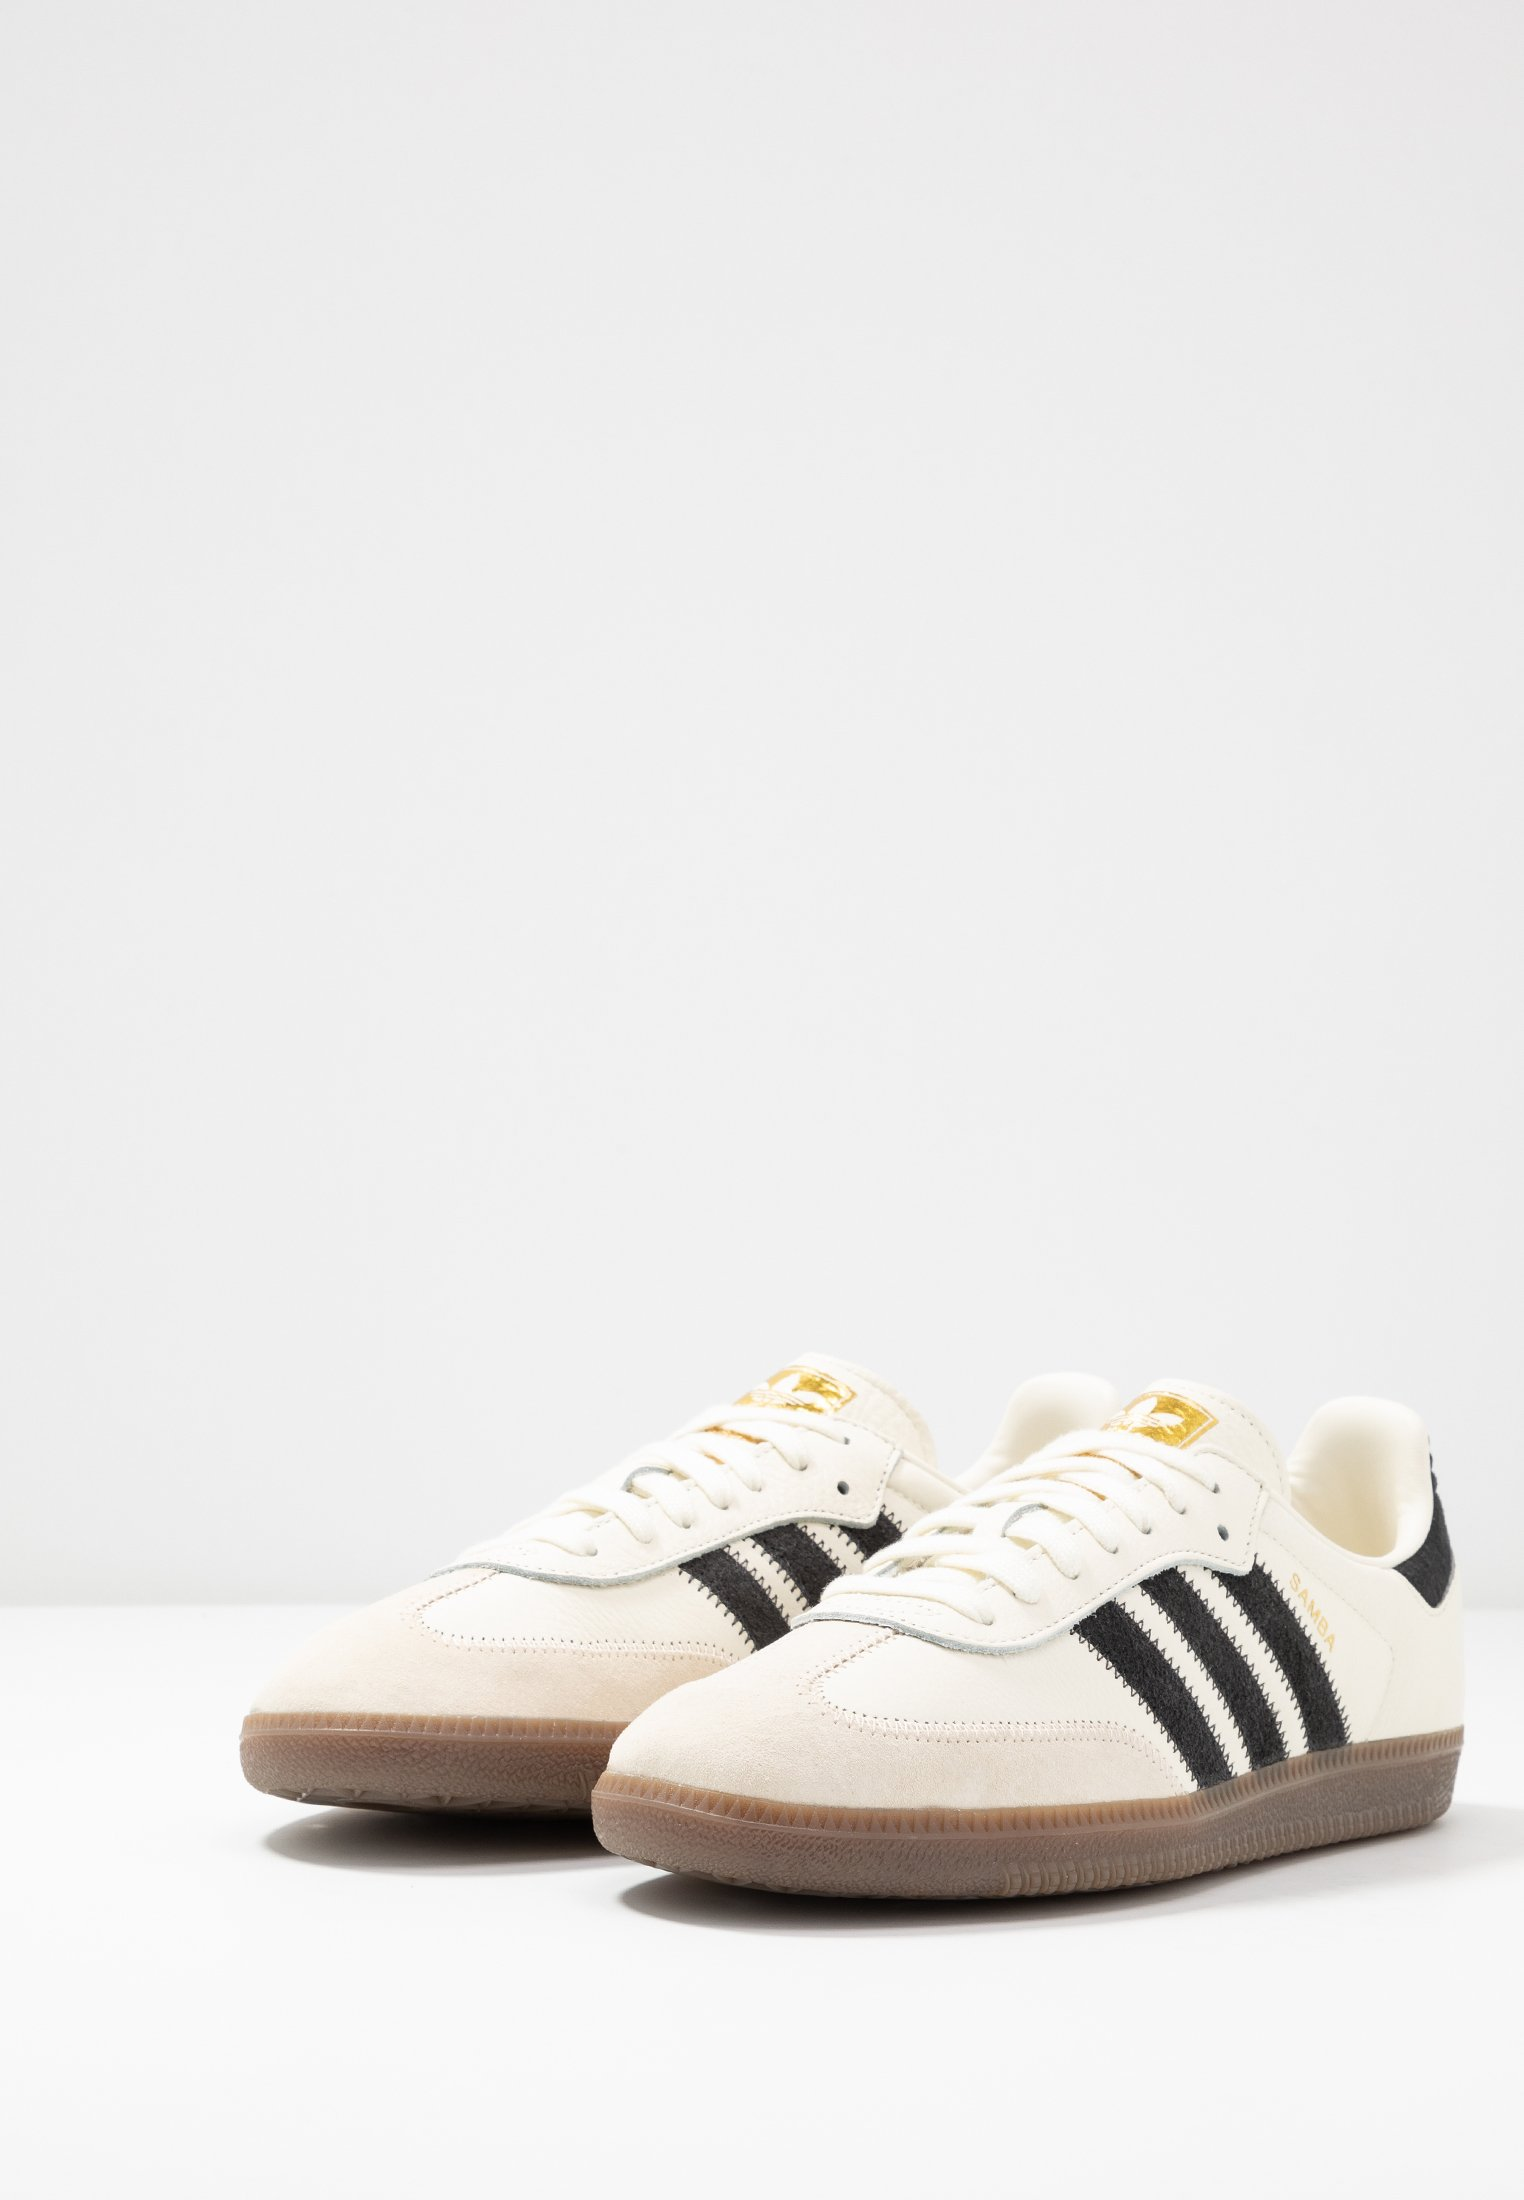 Originals Offwhite Adidas carbon Basses SambaBaskets uwPkXTOiZ